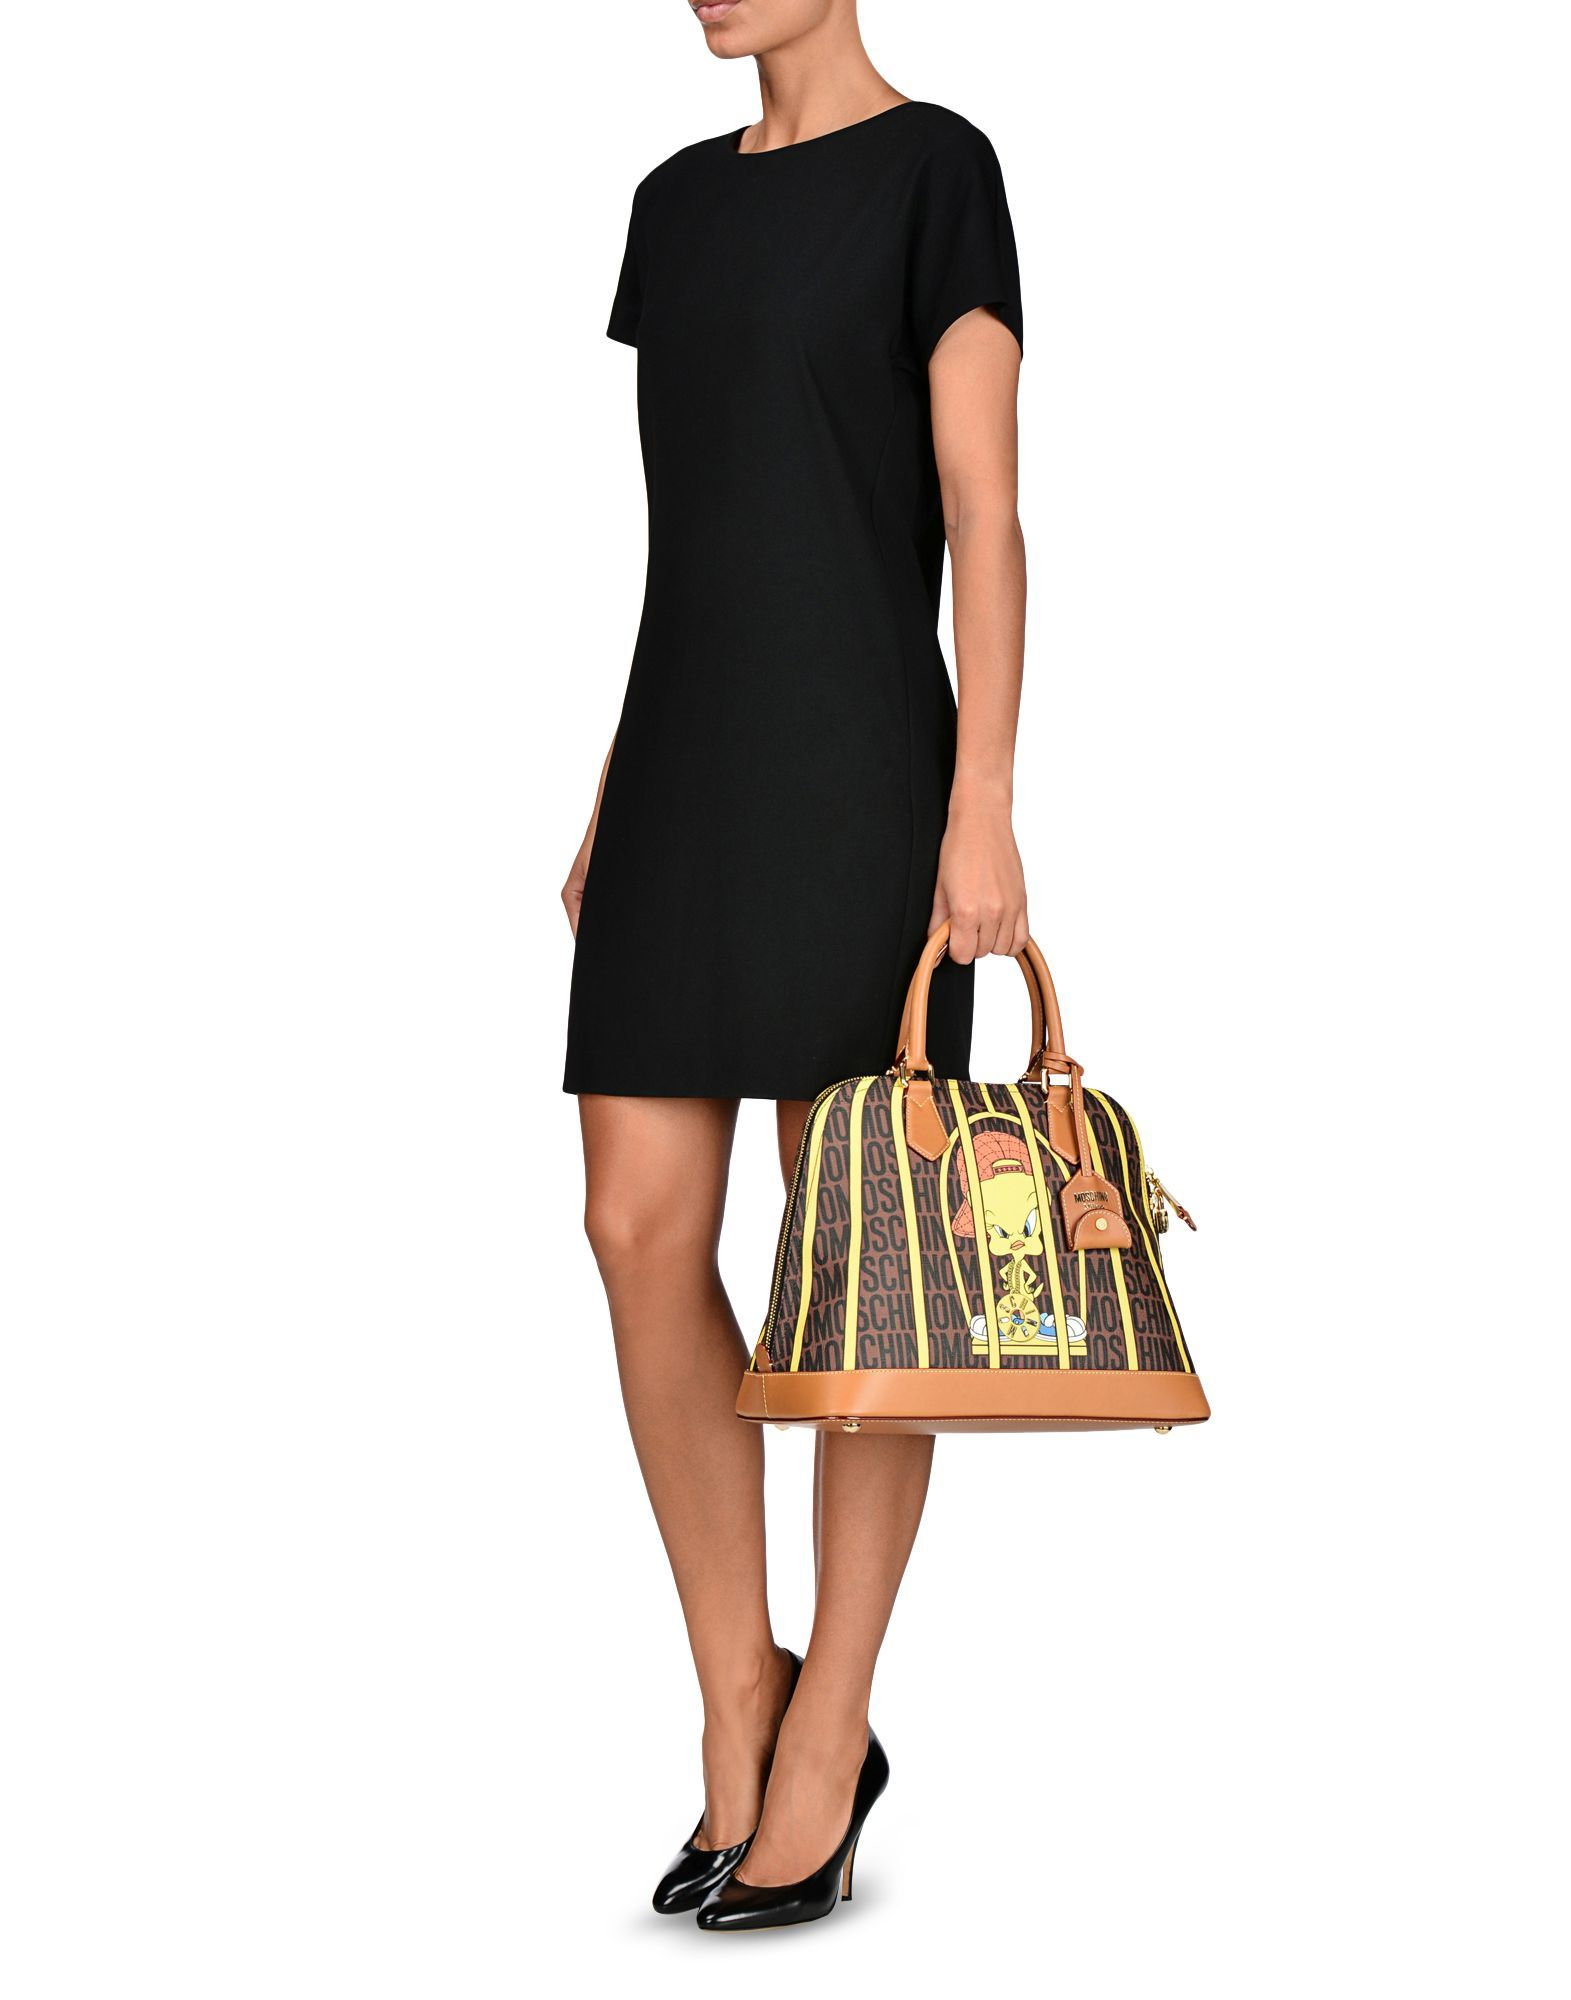 713bddfa93e Moschino x Looney Tunes Tweety purse bag | Licensed Products ...